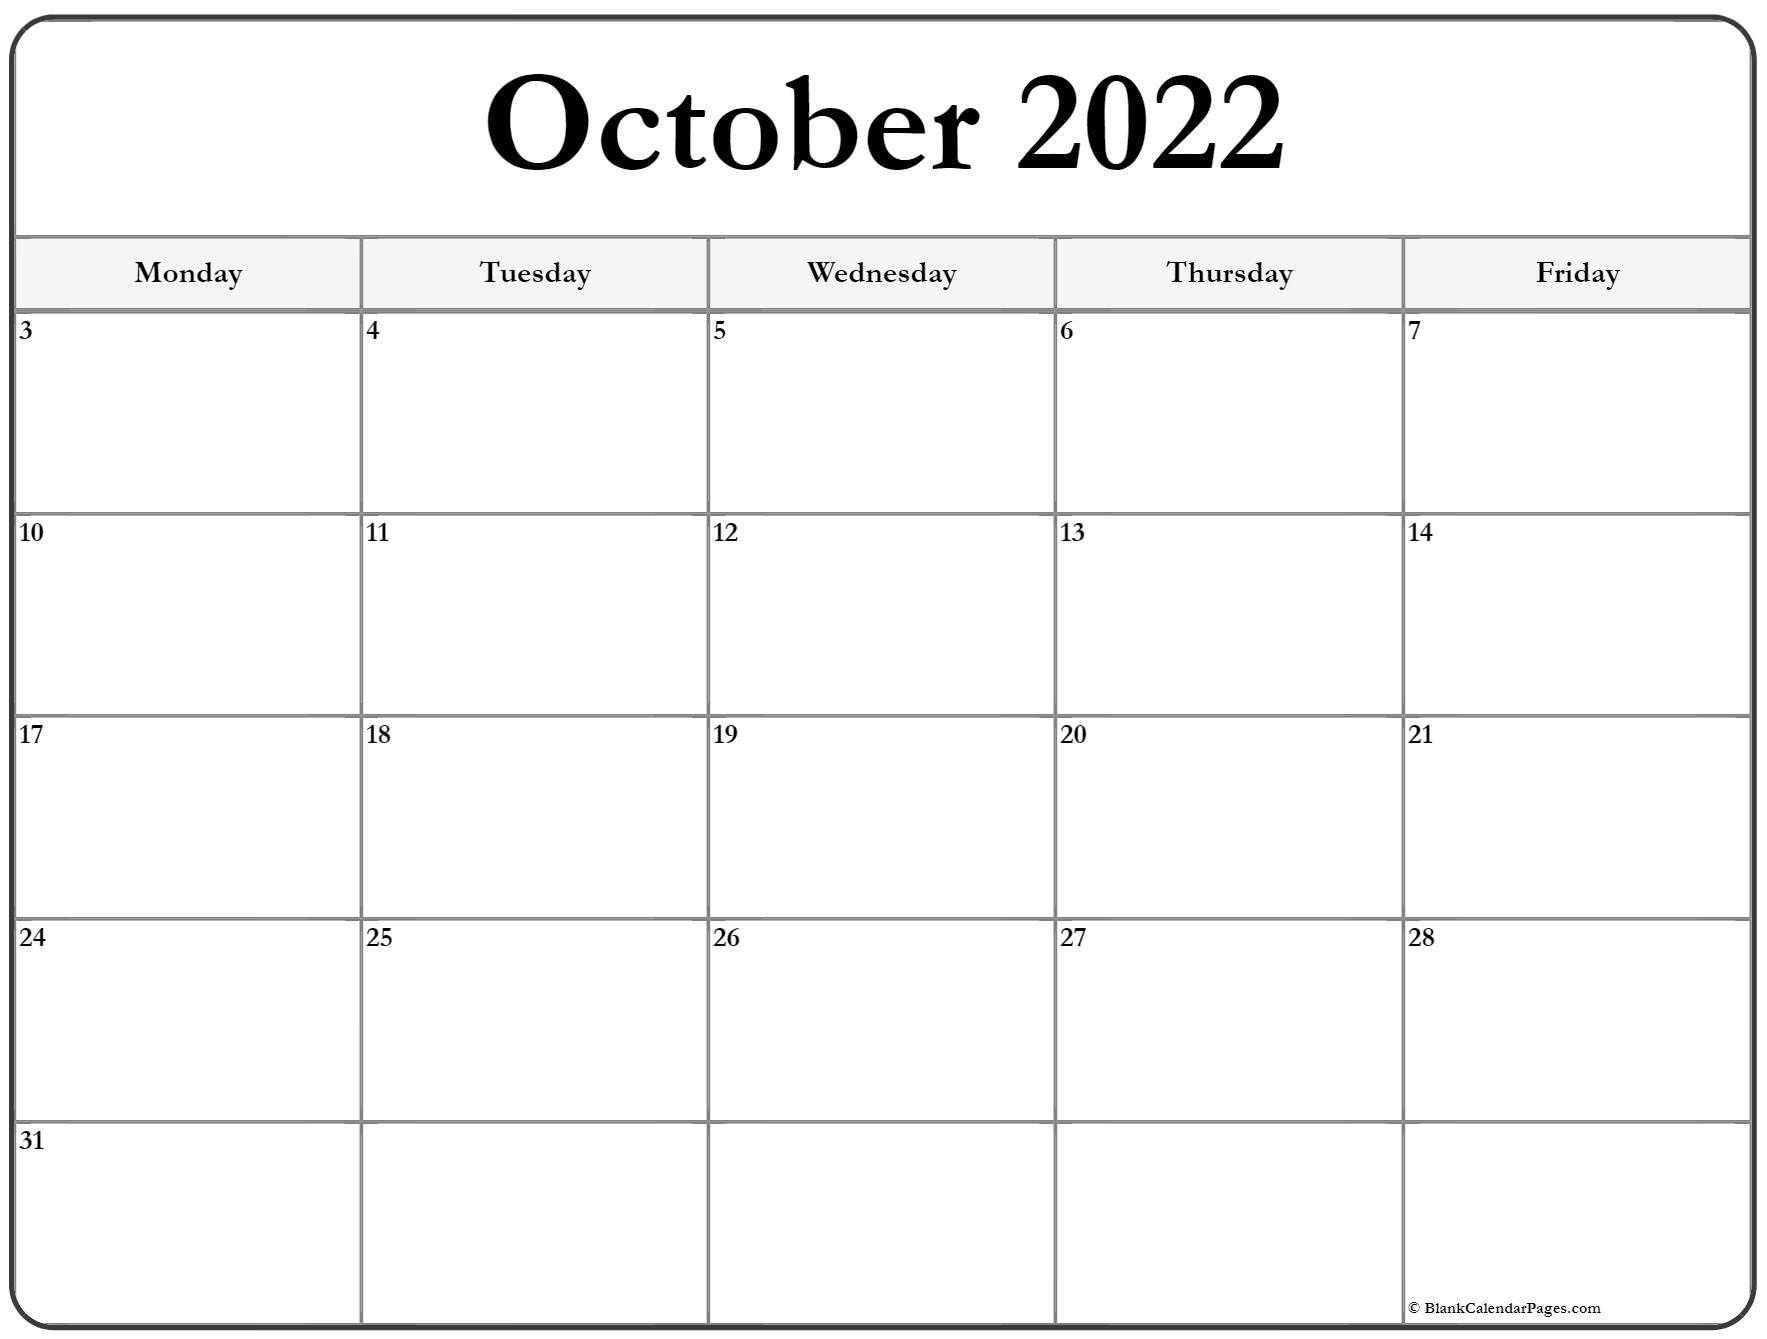 October 2022 Monday Calendar | Monday To Sunday-Printable Monday - Friday July 2021